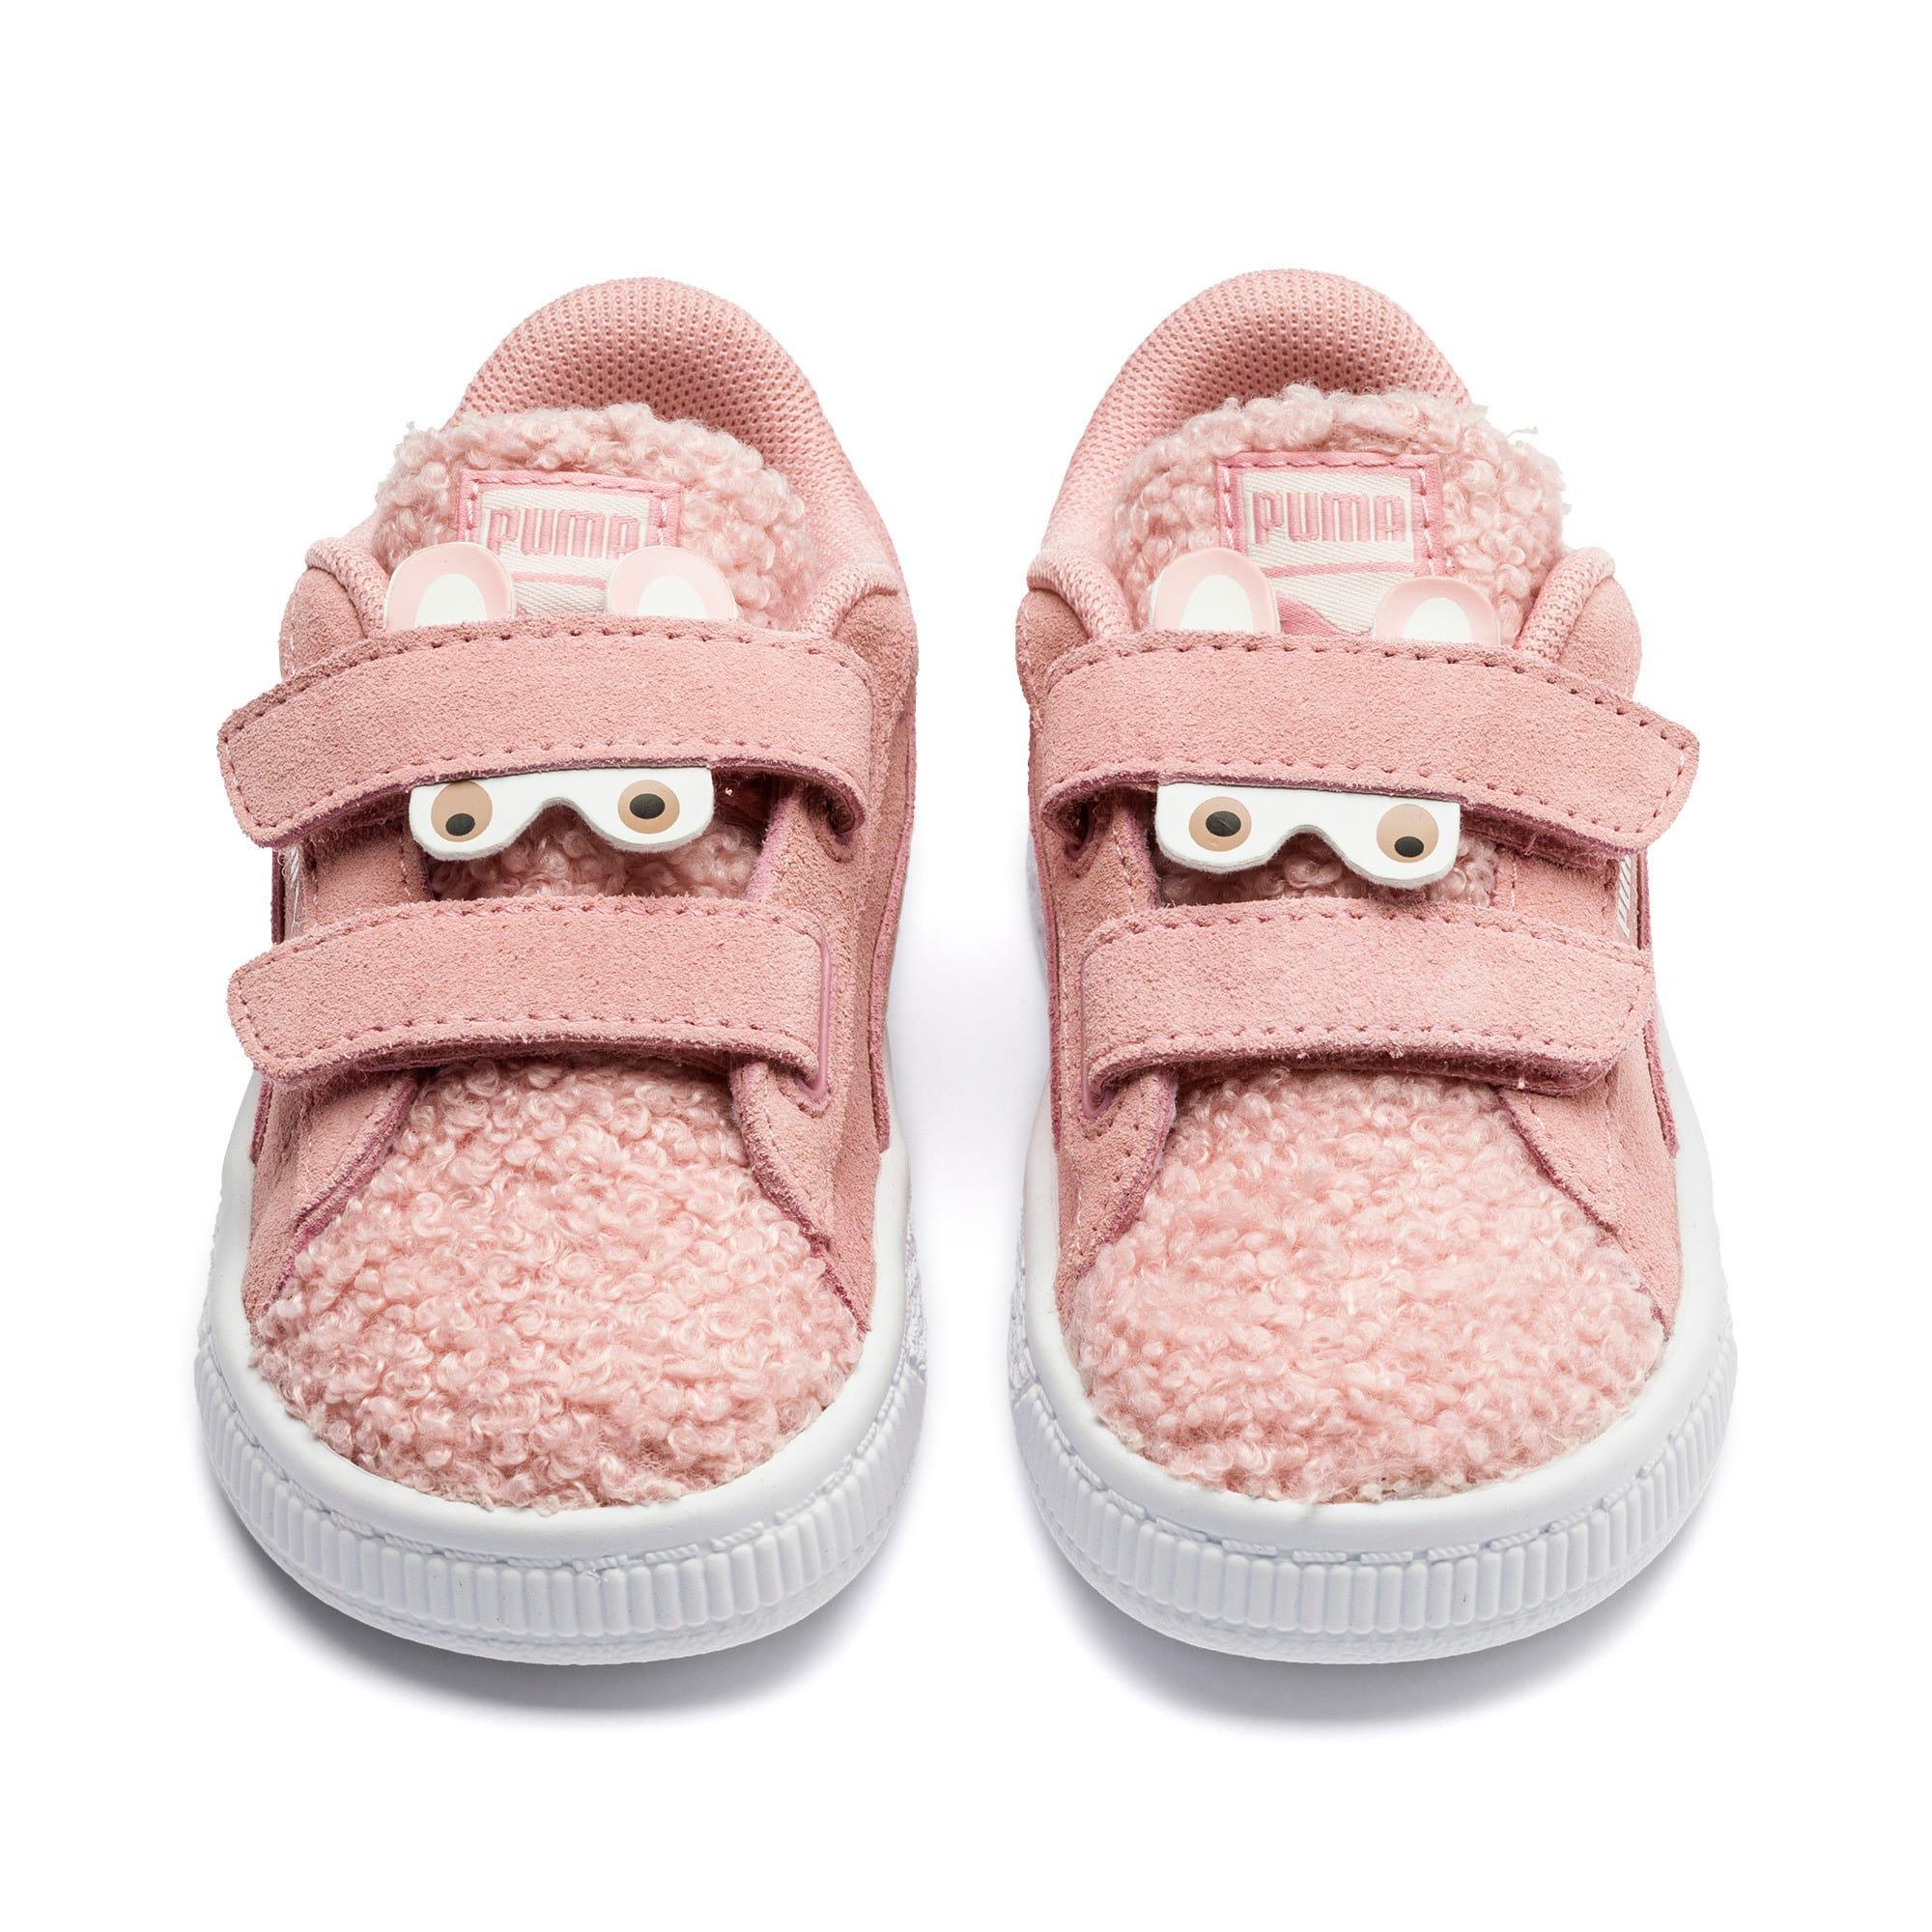 Thumbnail 7 of Suede Winter Monster Toddler Shoes, Bridal Rose-Mocha Mousse, medium